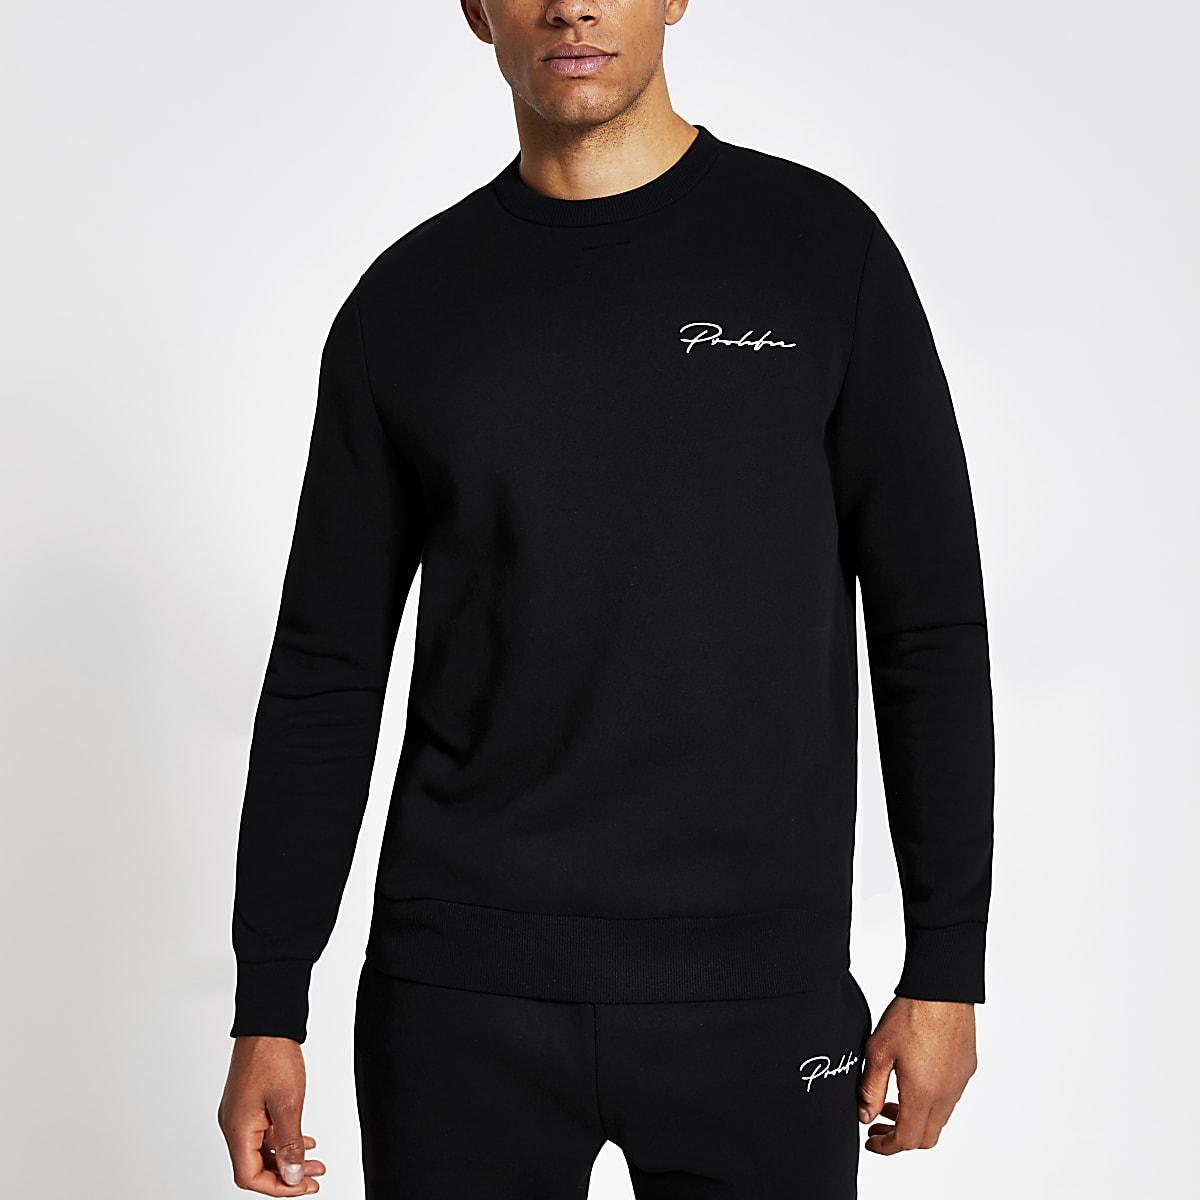 Black Prolific slim fit sweatshirt